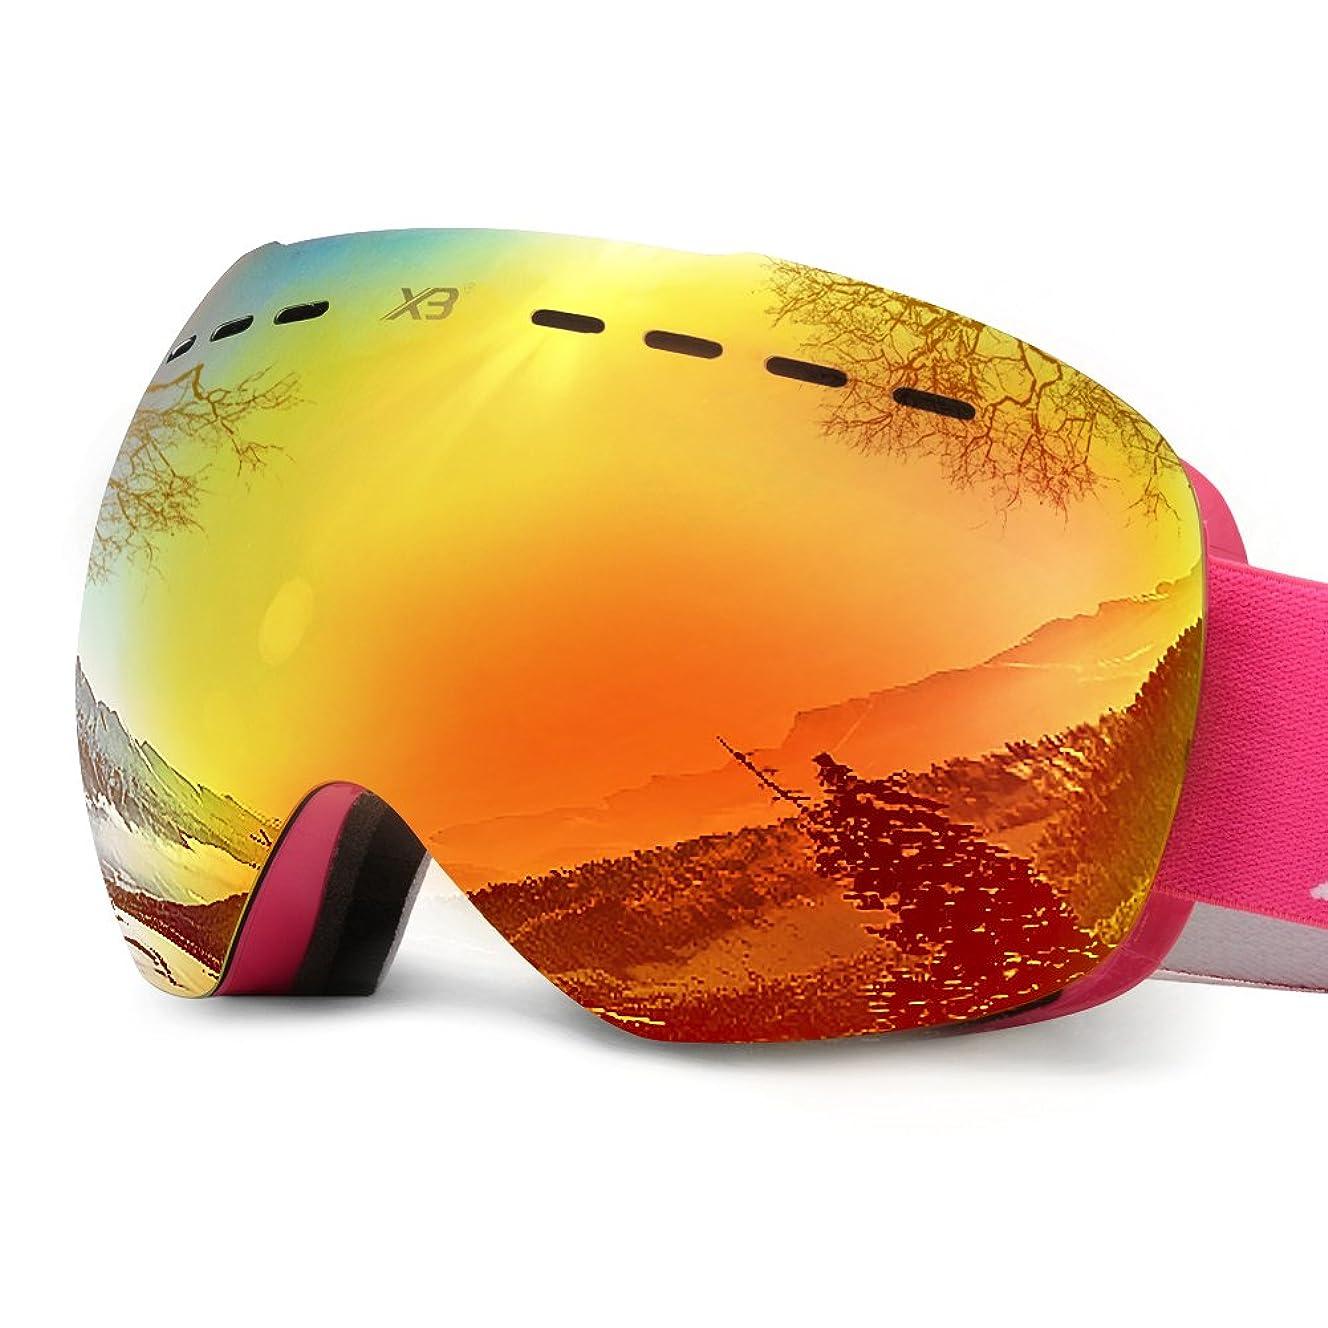 Mounchain Ski Goggles, OTG Snowboard Goggles 100% UV Protection, Snow Goggles Anti-Fog, Helmet Compatible, Interchangeable Lens for Men Women Skiing Snowmobile Skating